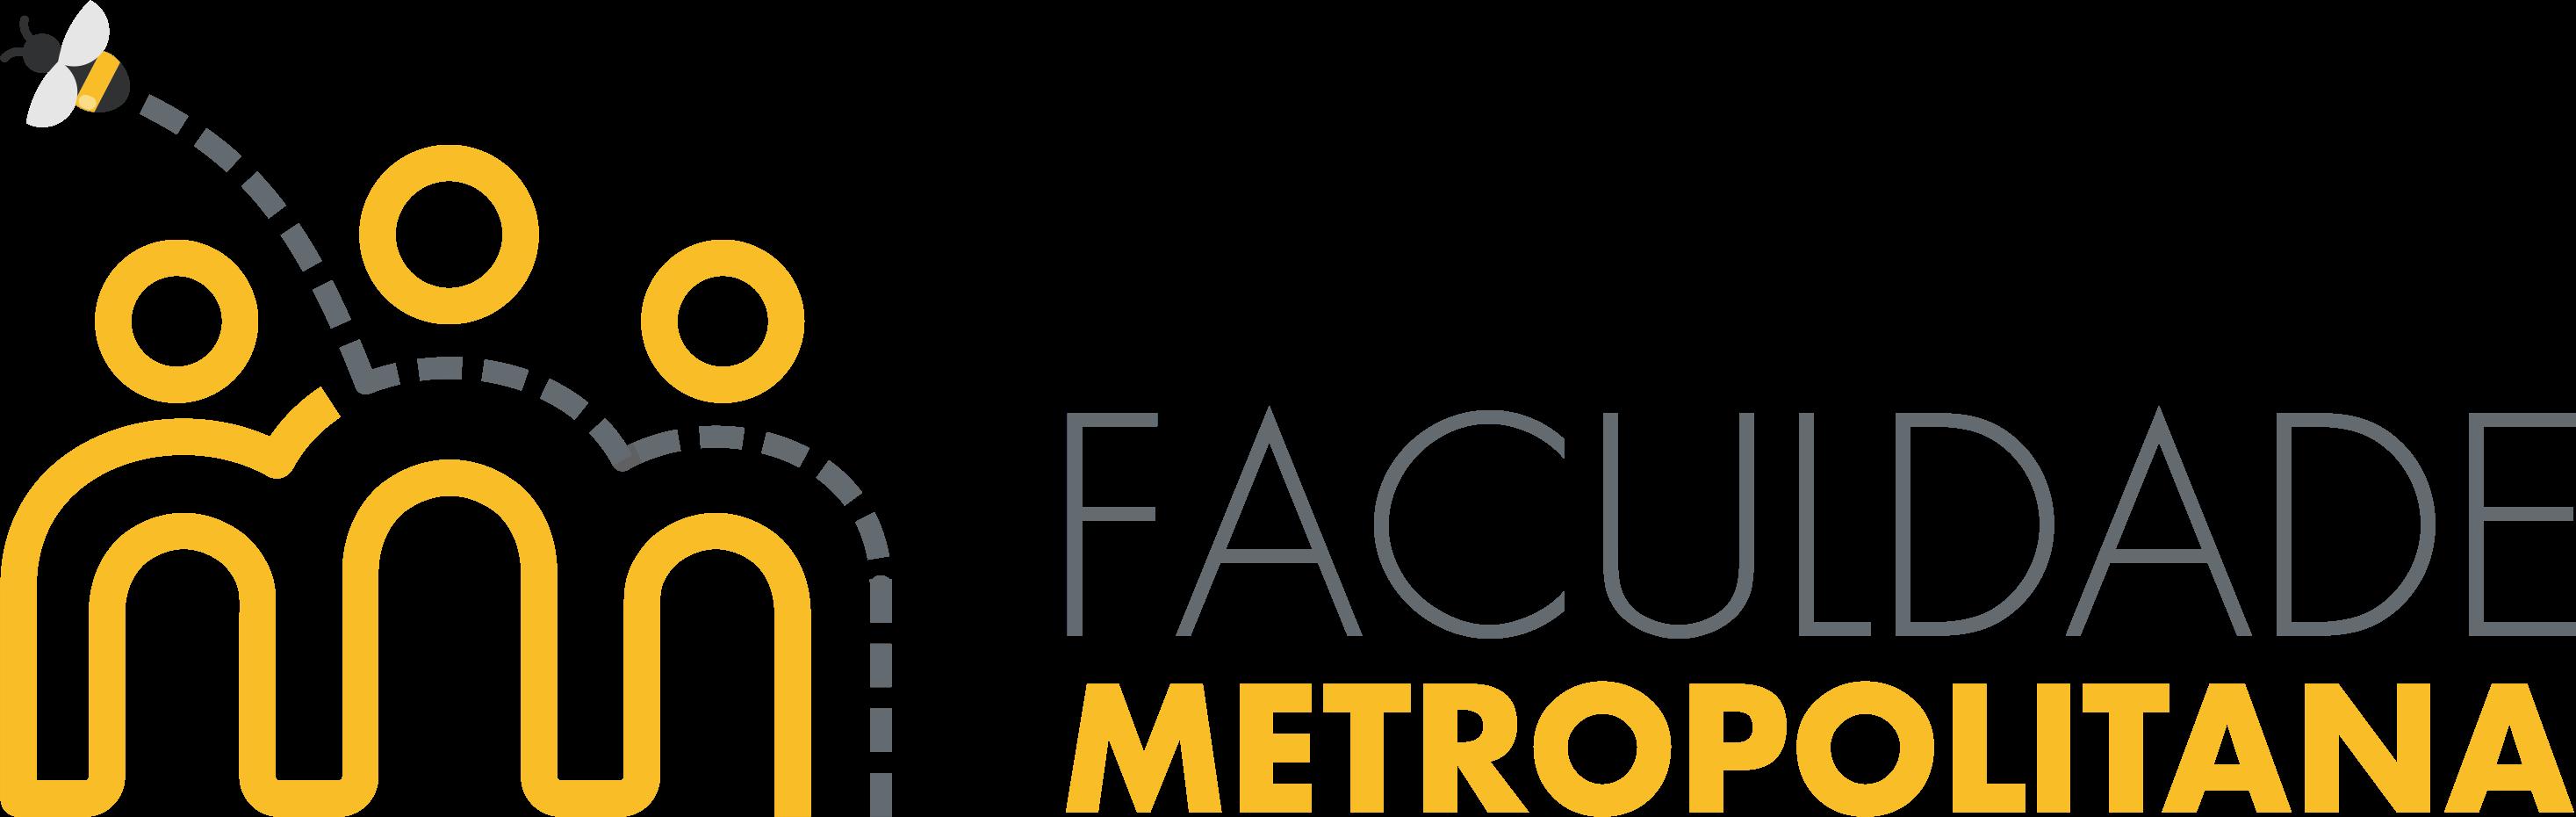 Faculdade Metropolitana